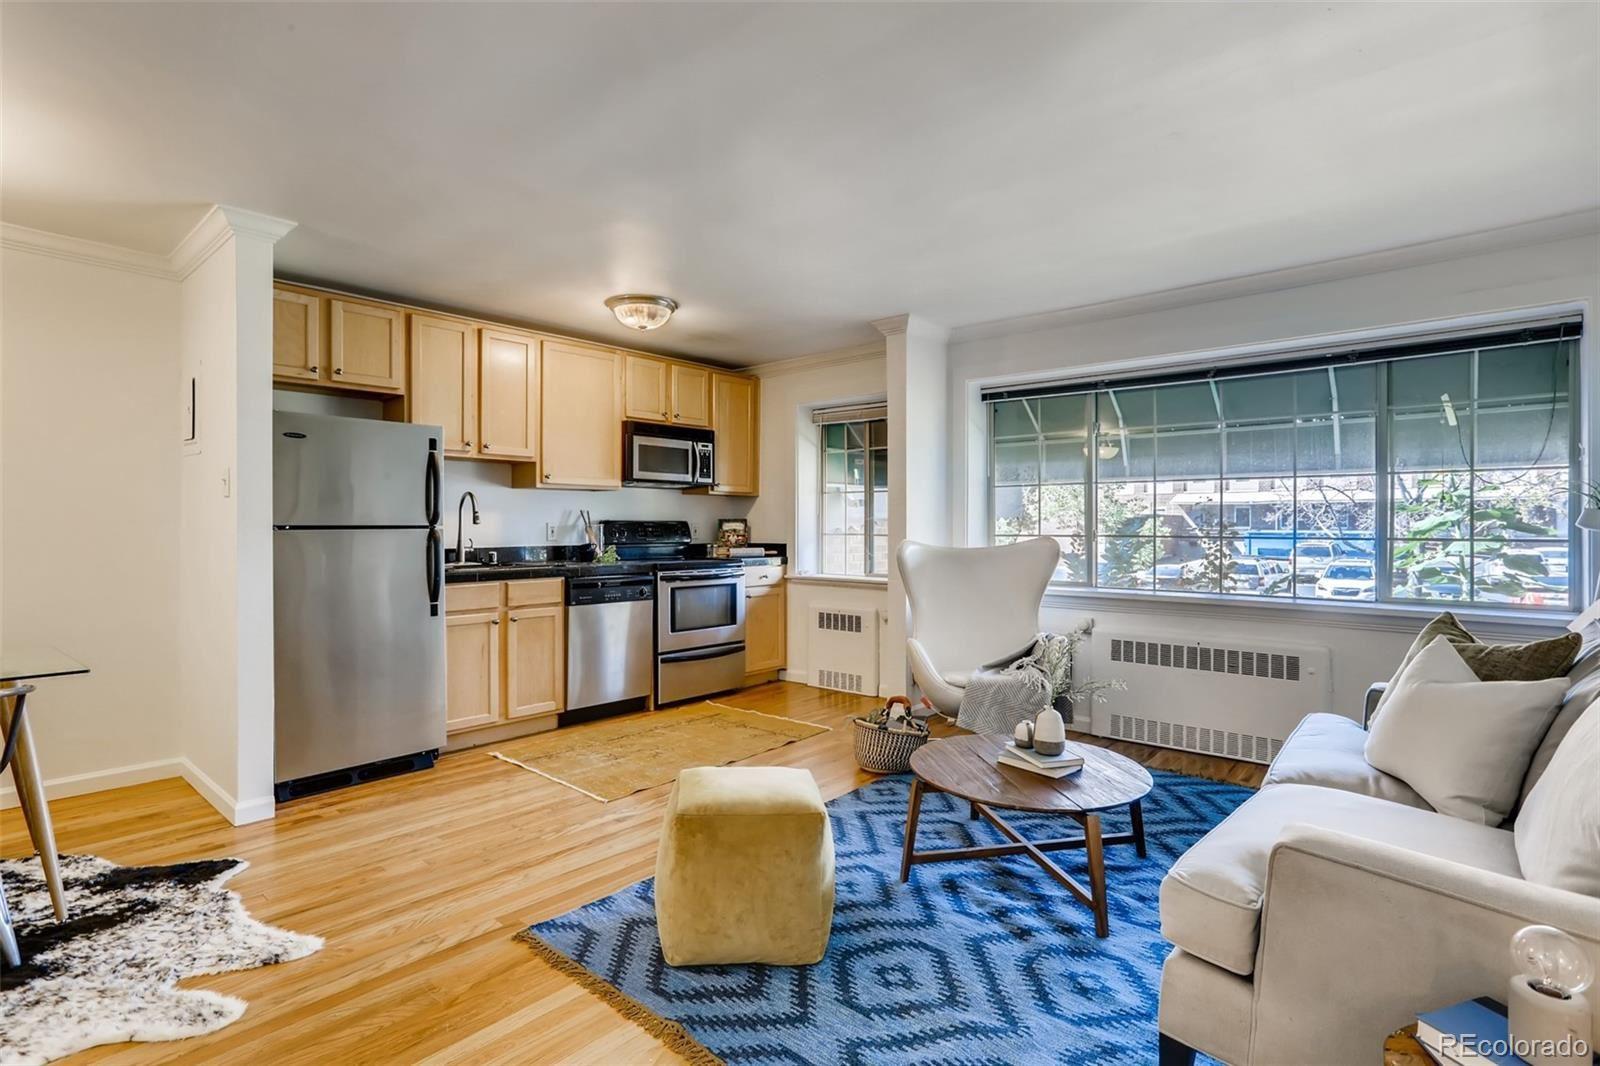 Photo of 1450 Albion Street #104, Denver, CO 80220 (MLS # 6907989)